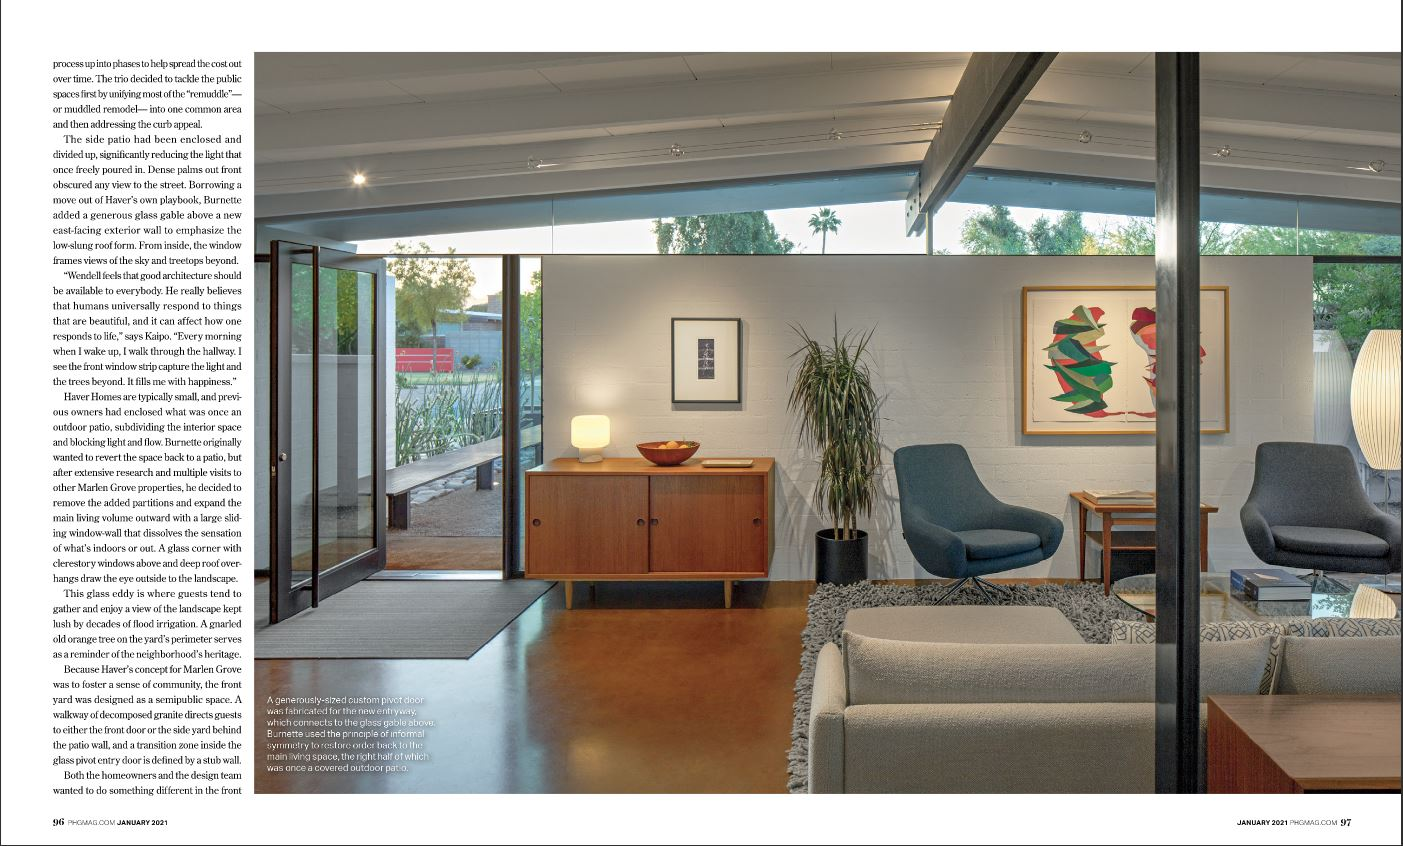 Phoenix Home & Garden: Embracing the New P2